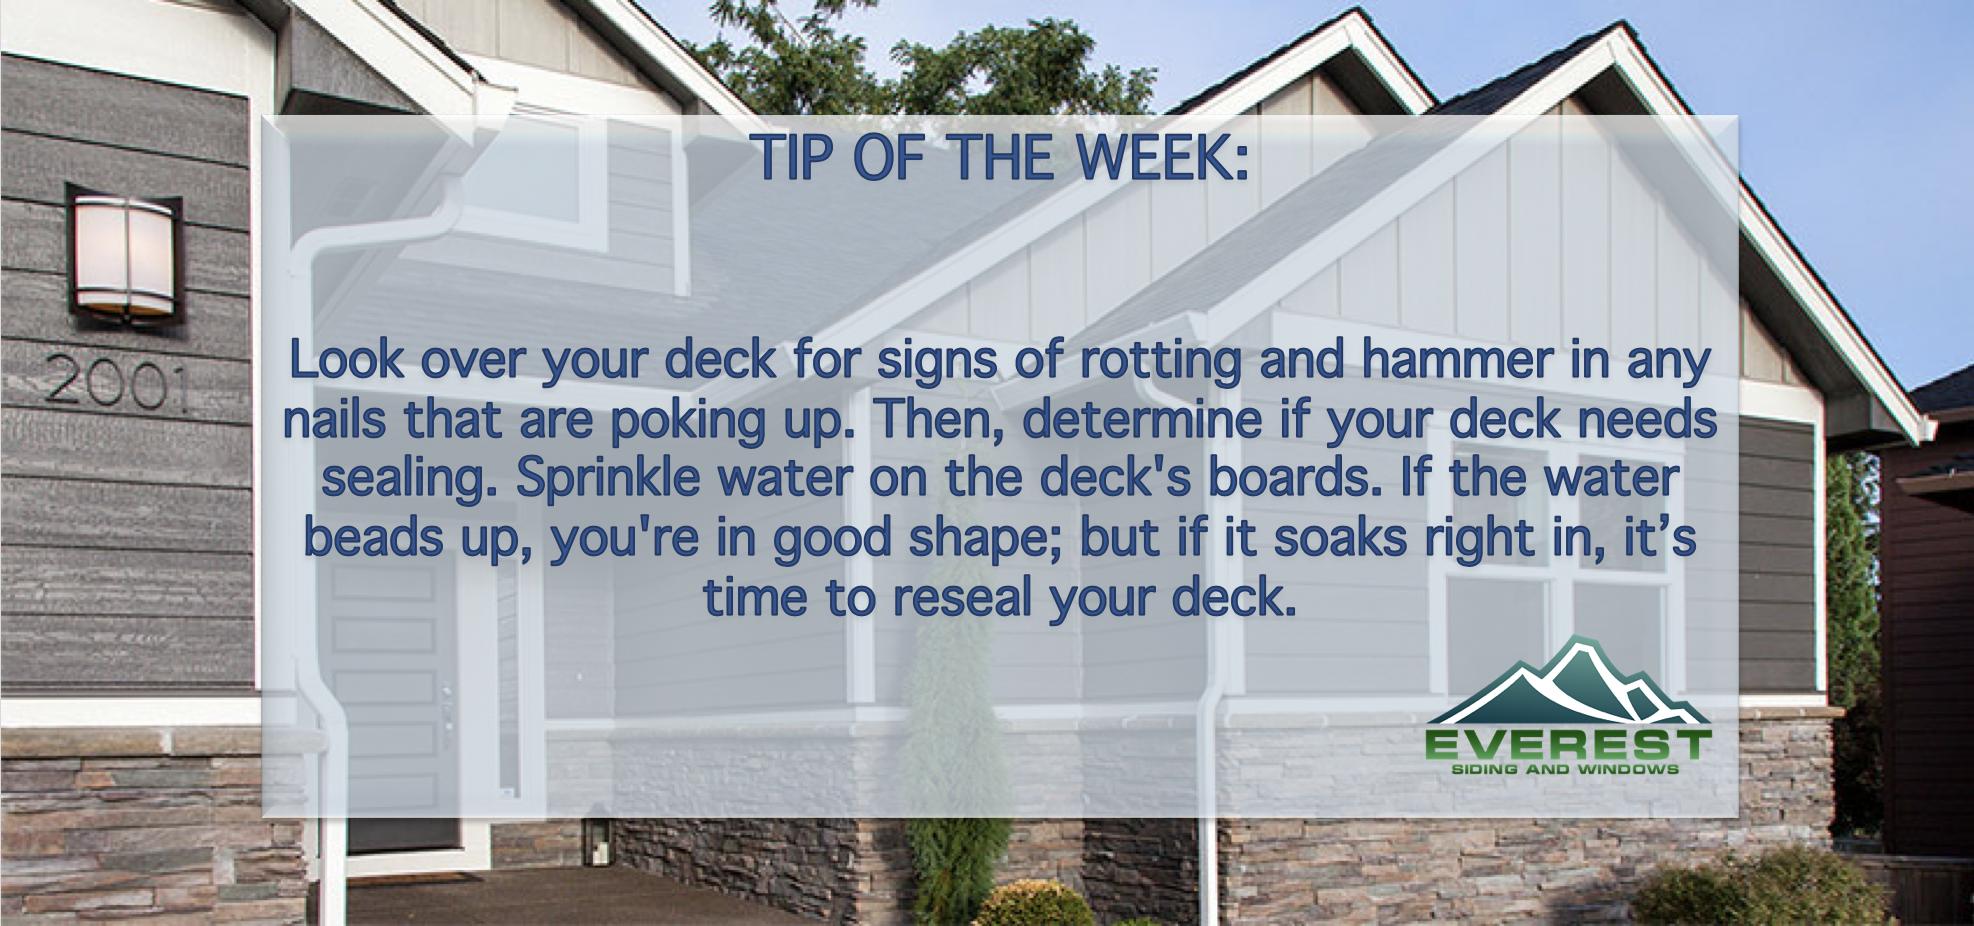 Useful Tip If You Have A Deck Houston Cypress Texas Hardieplank Lpsmartside Siding Windows Roofing Homeim Window Vinyl Hardie Plank Window Well